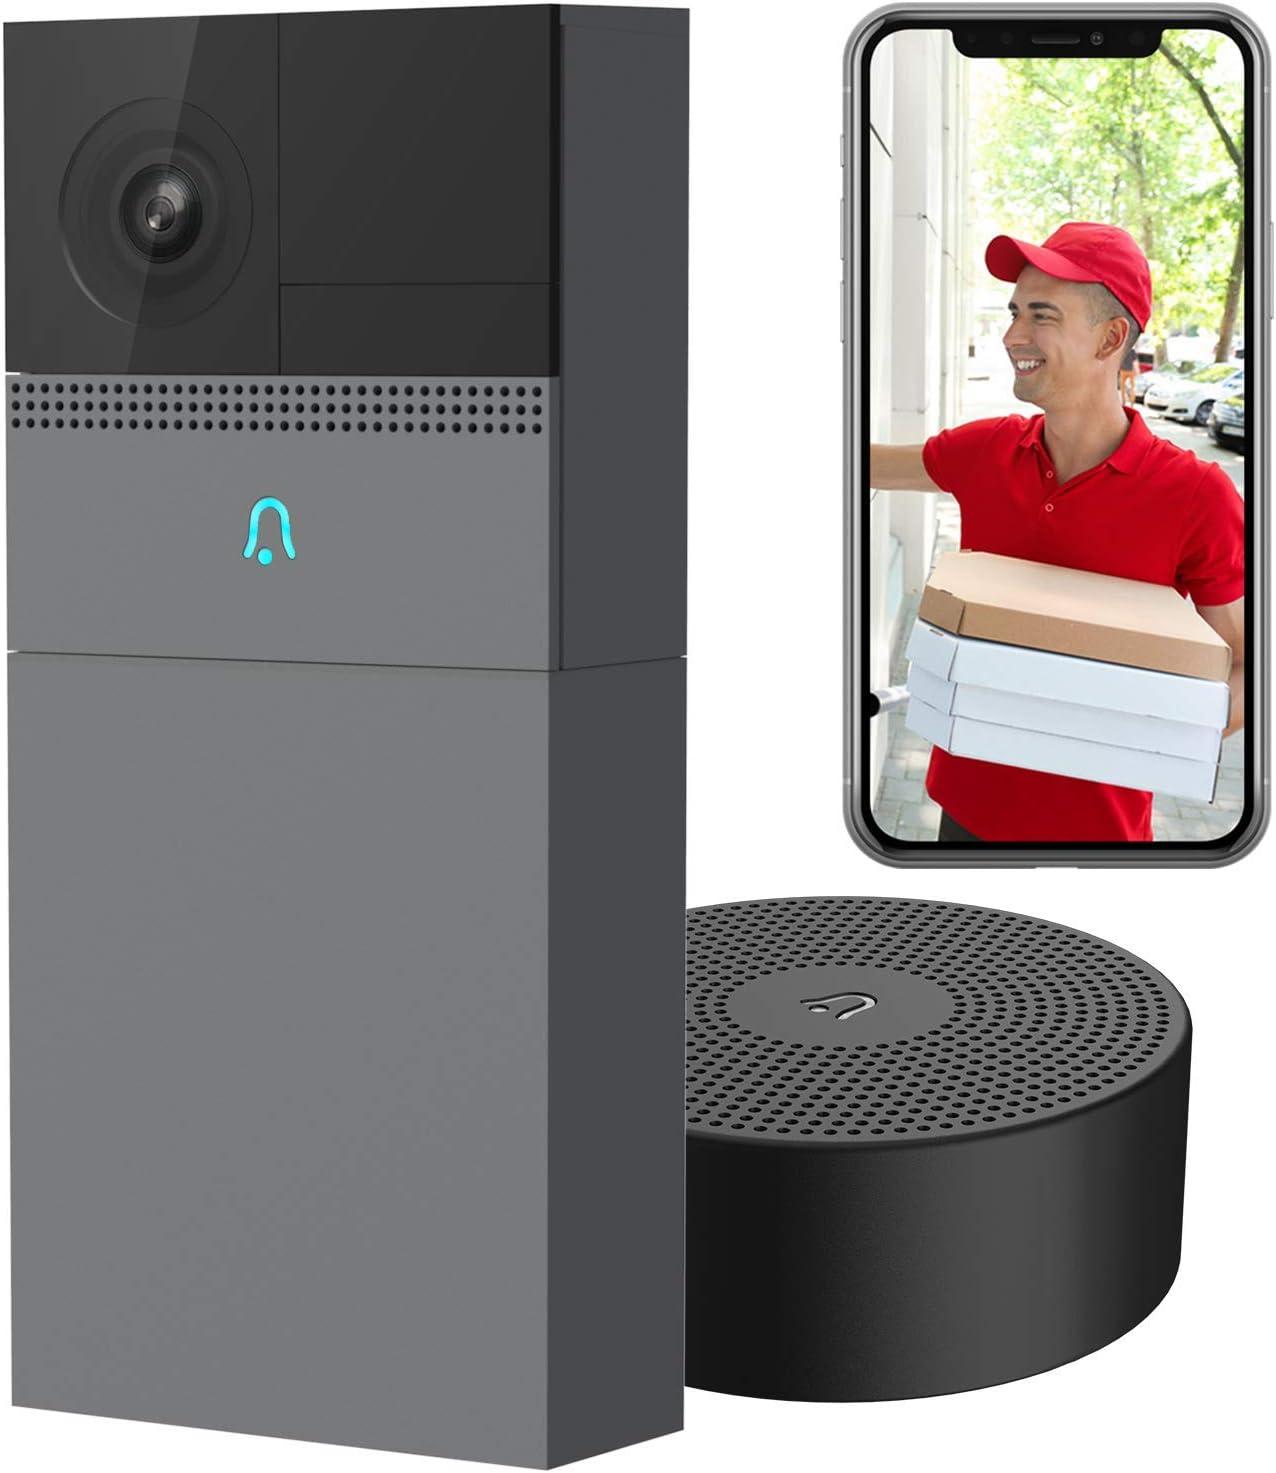 LAXIHUB WiFi Doorbell with FHD Camera